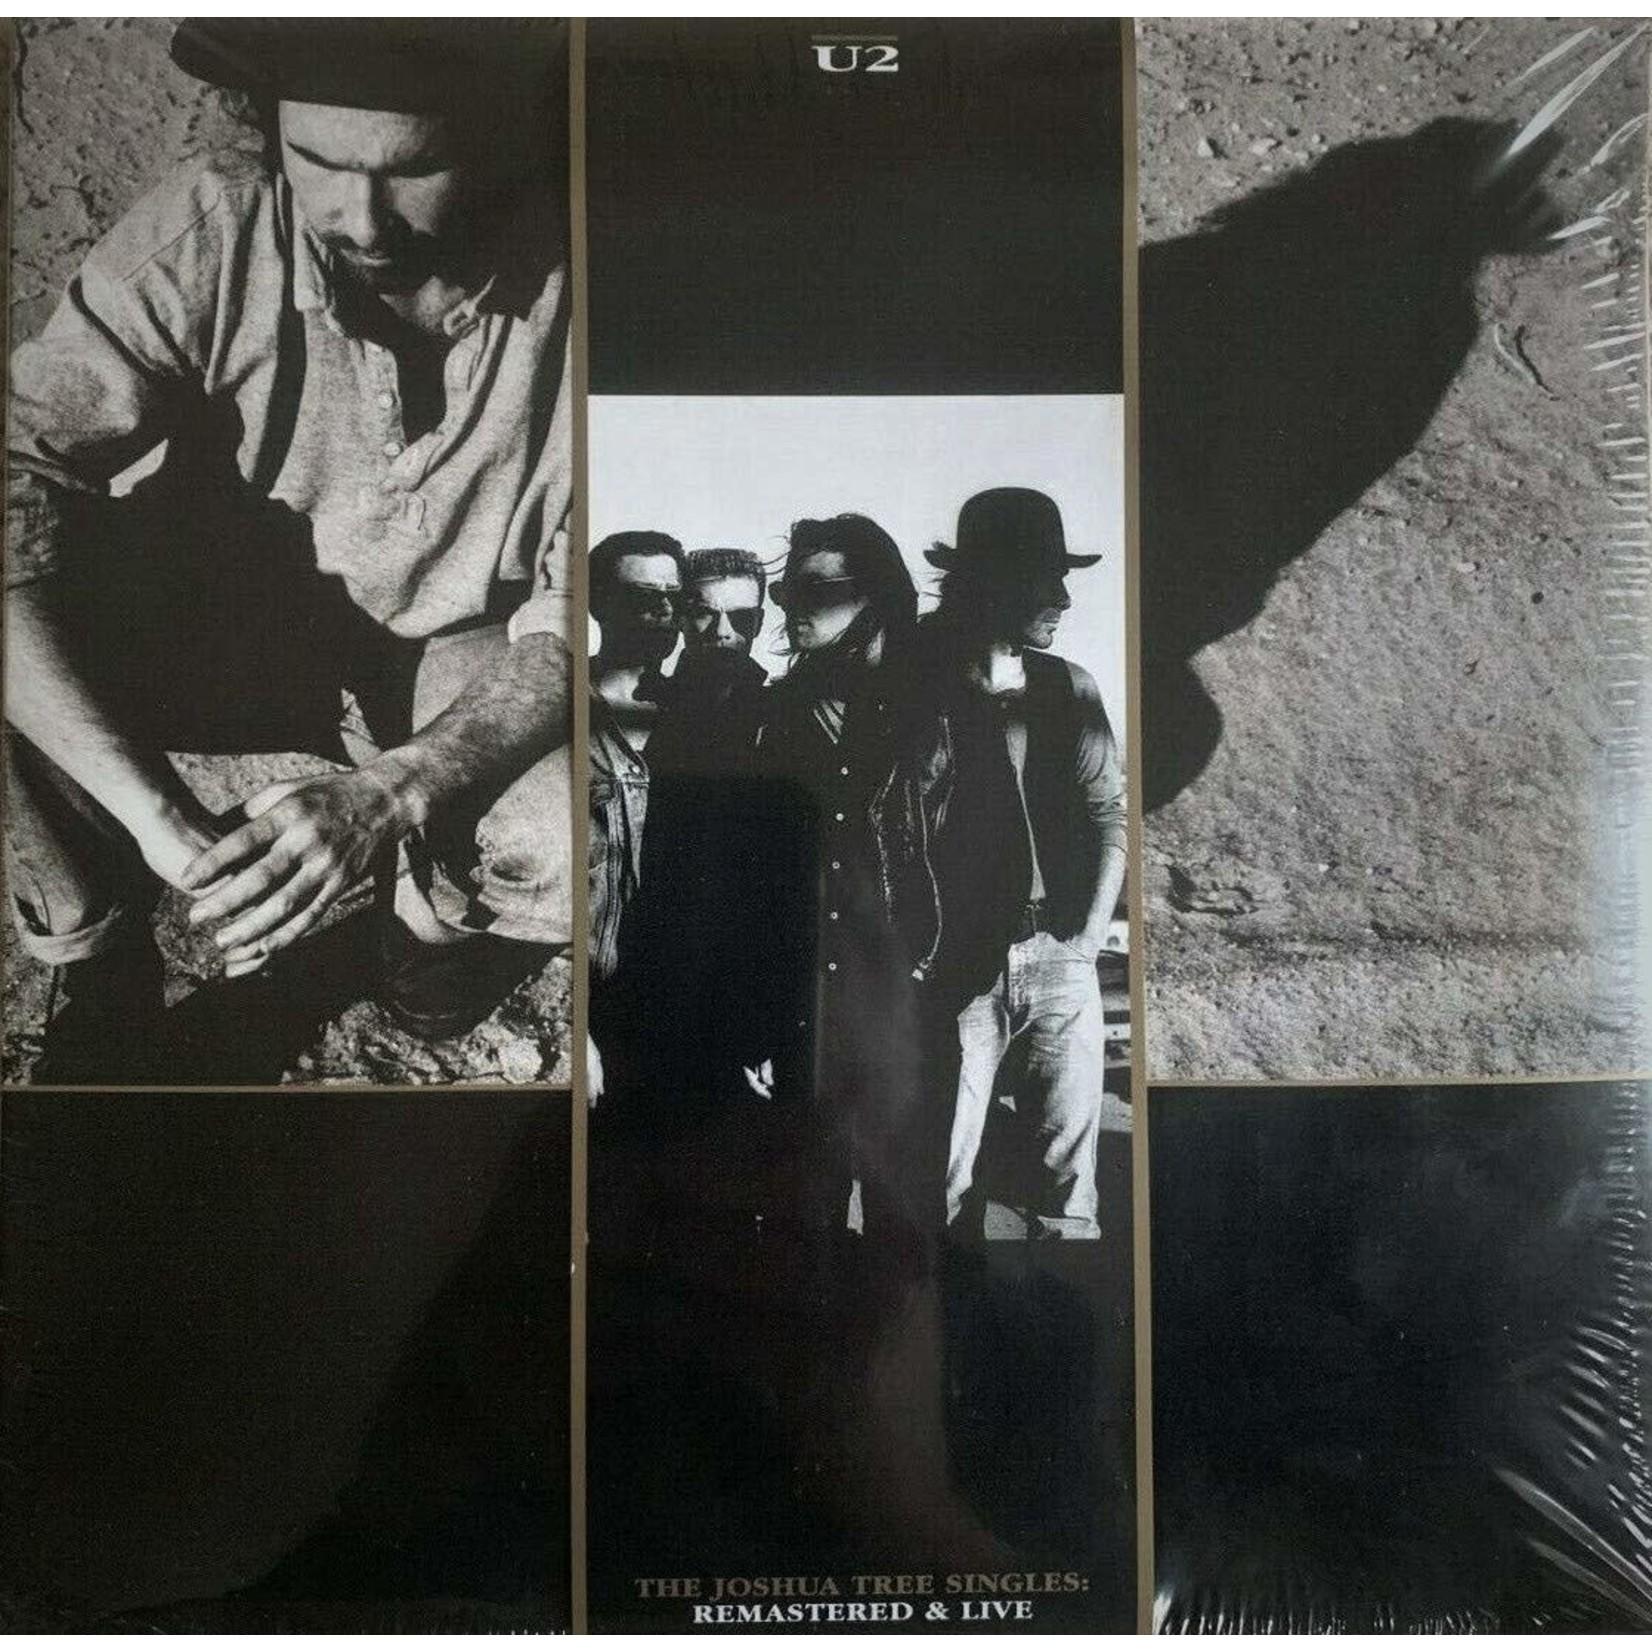 Vinyl u2 - The Joshua Tree Singles - Remastered and Live